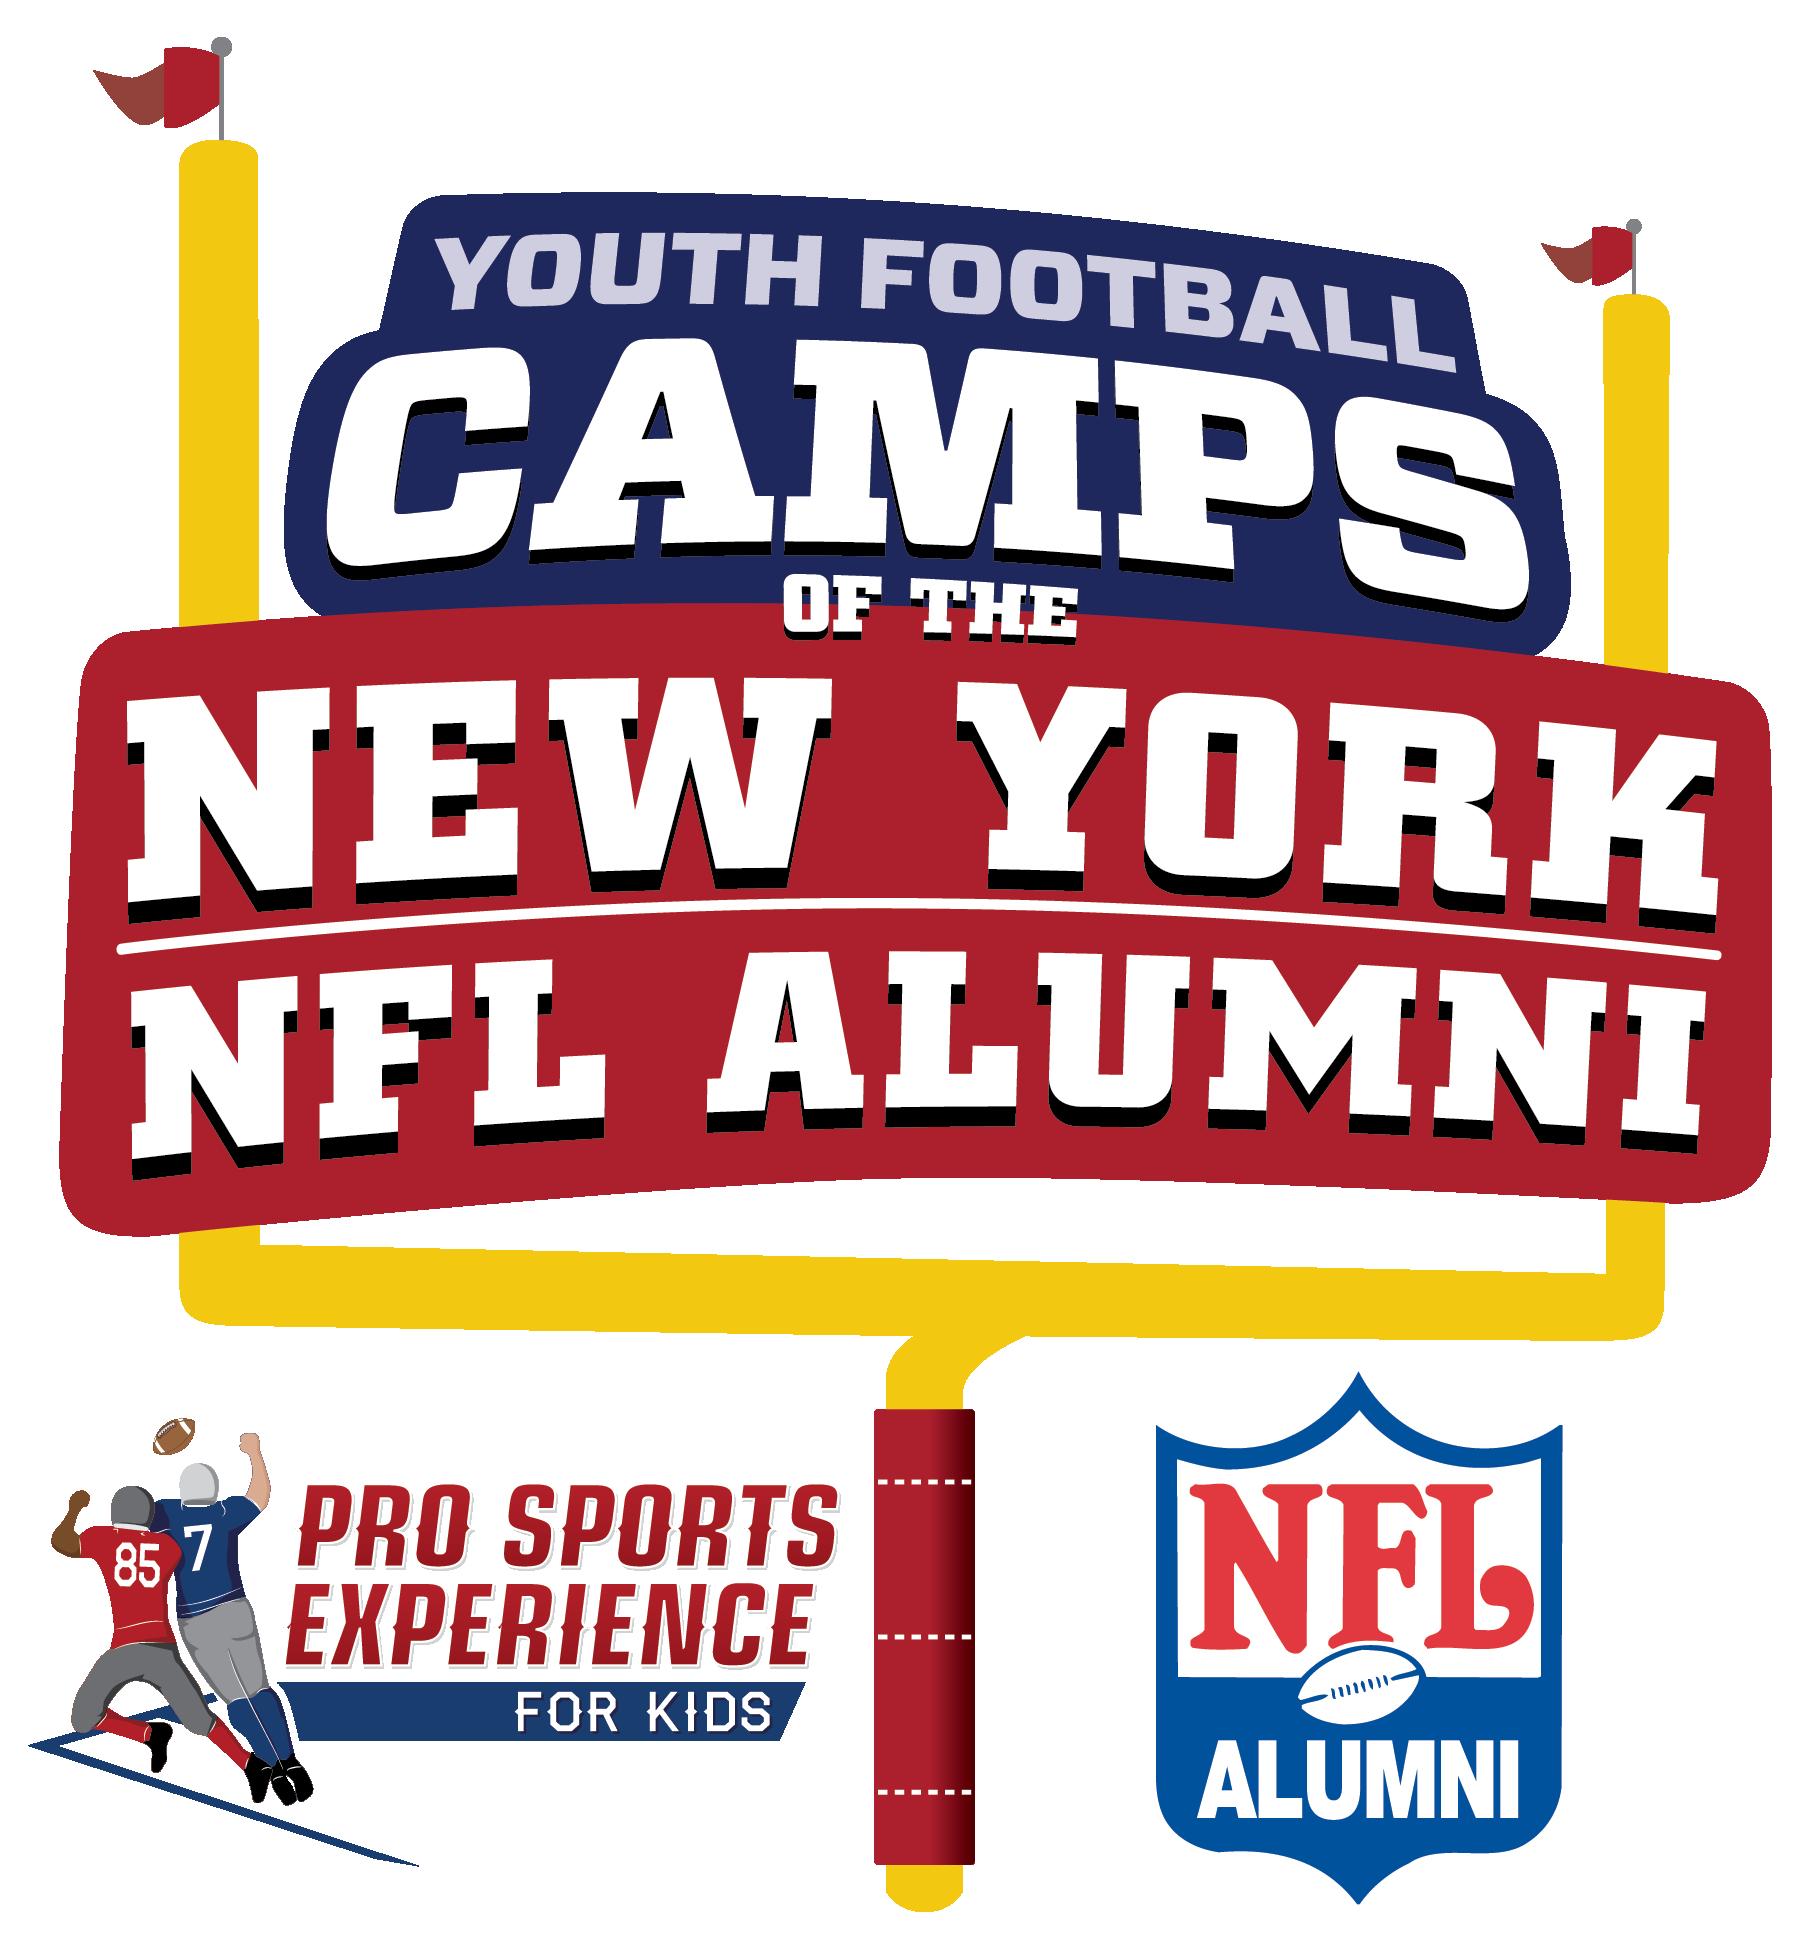 New York NFL Alumni Hero Youth Football Camps - Greenwich